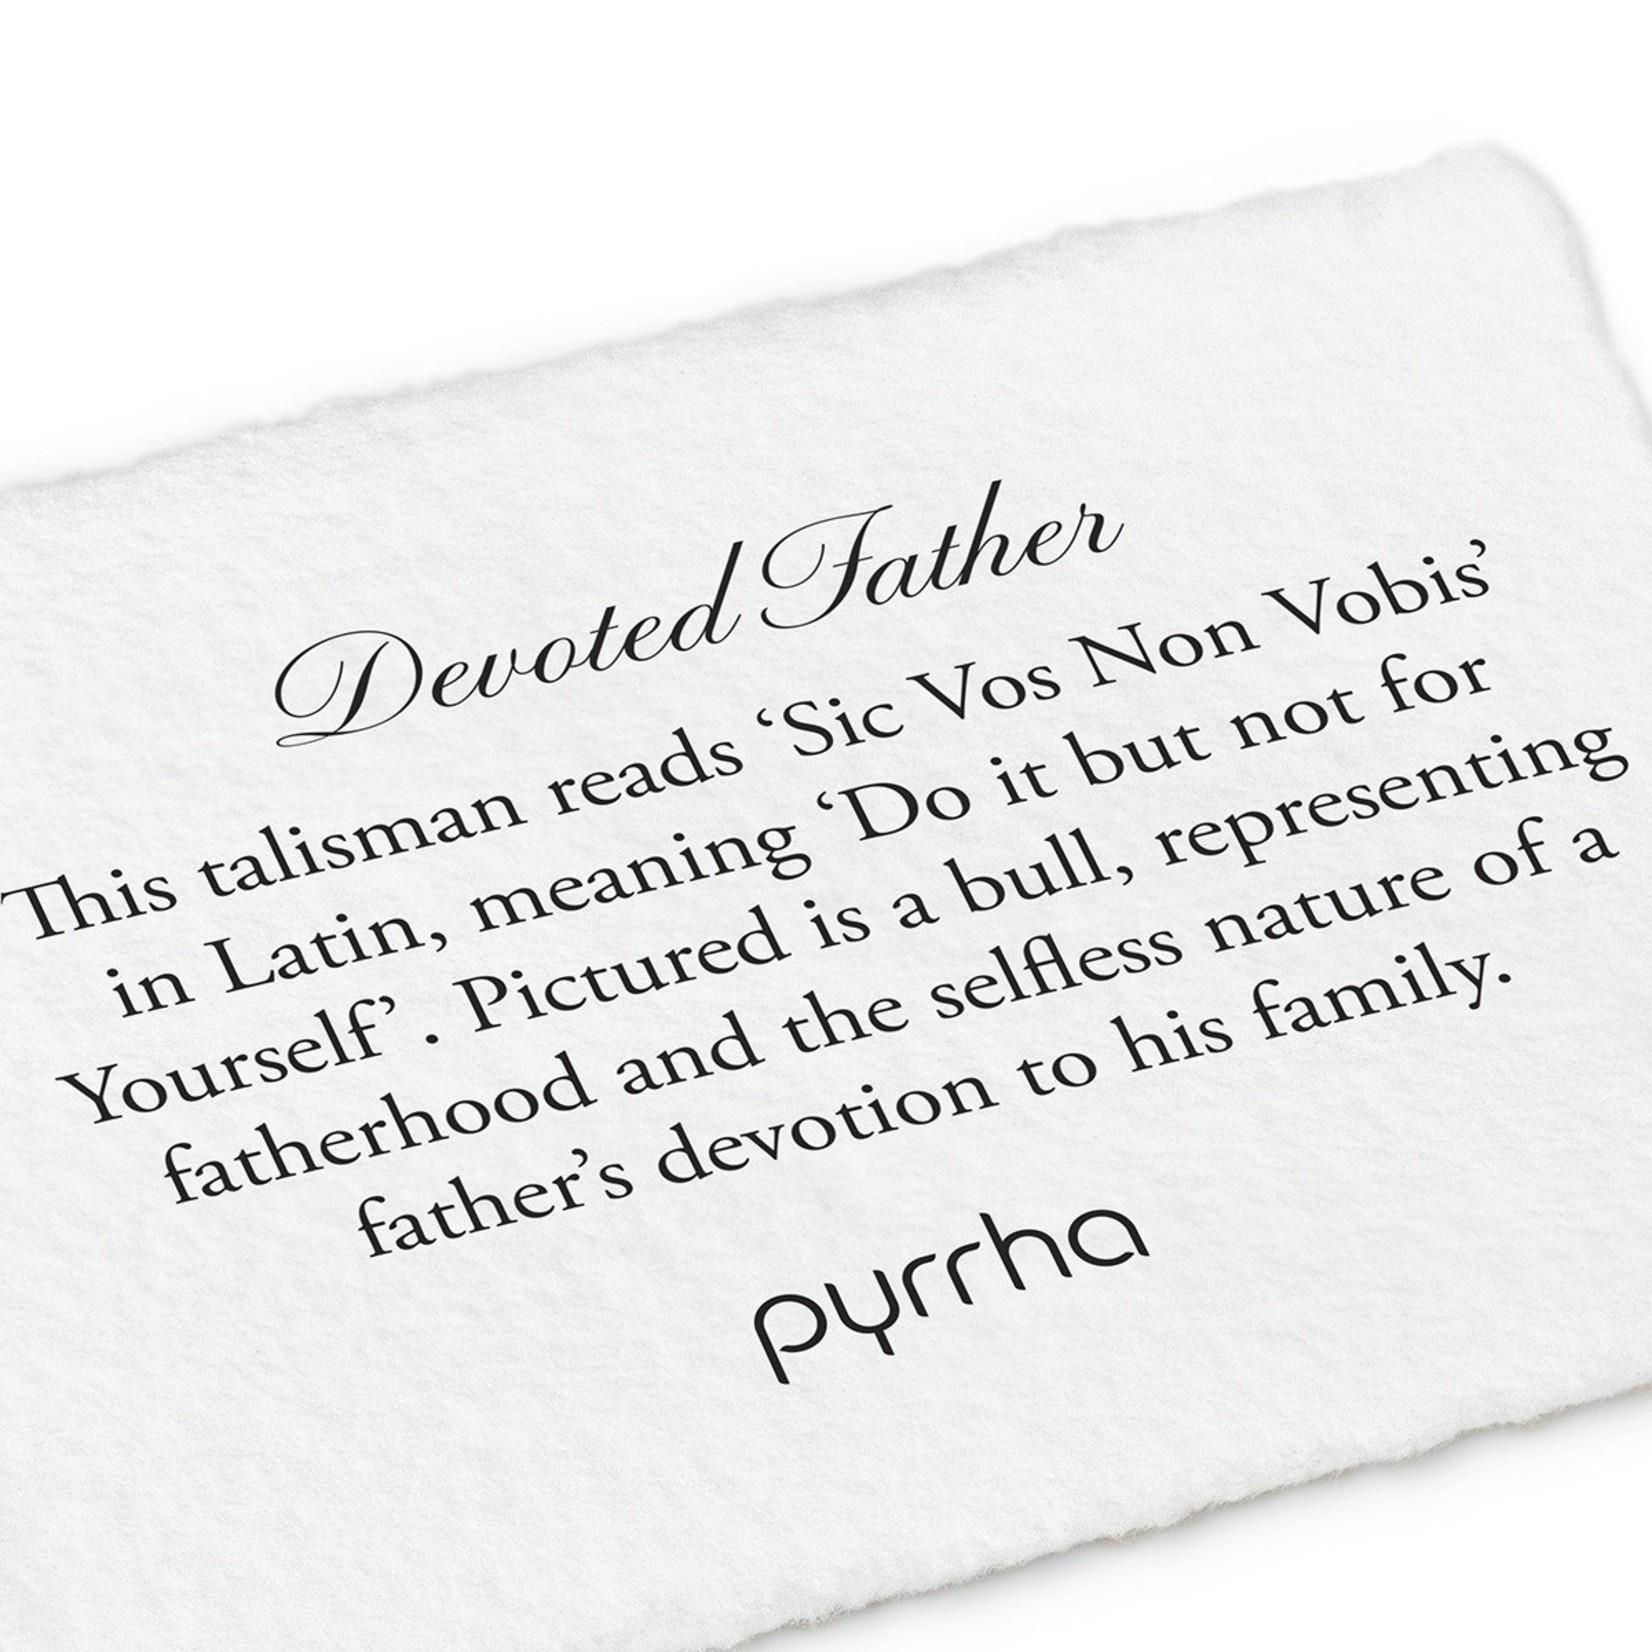 Pyrrha Devoted Father Signature Talisman